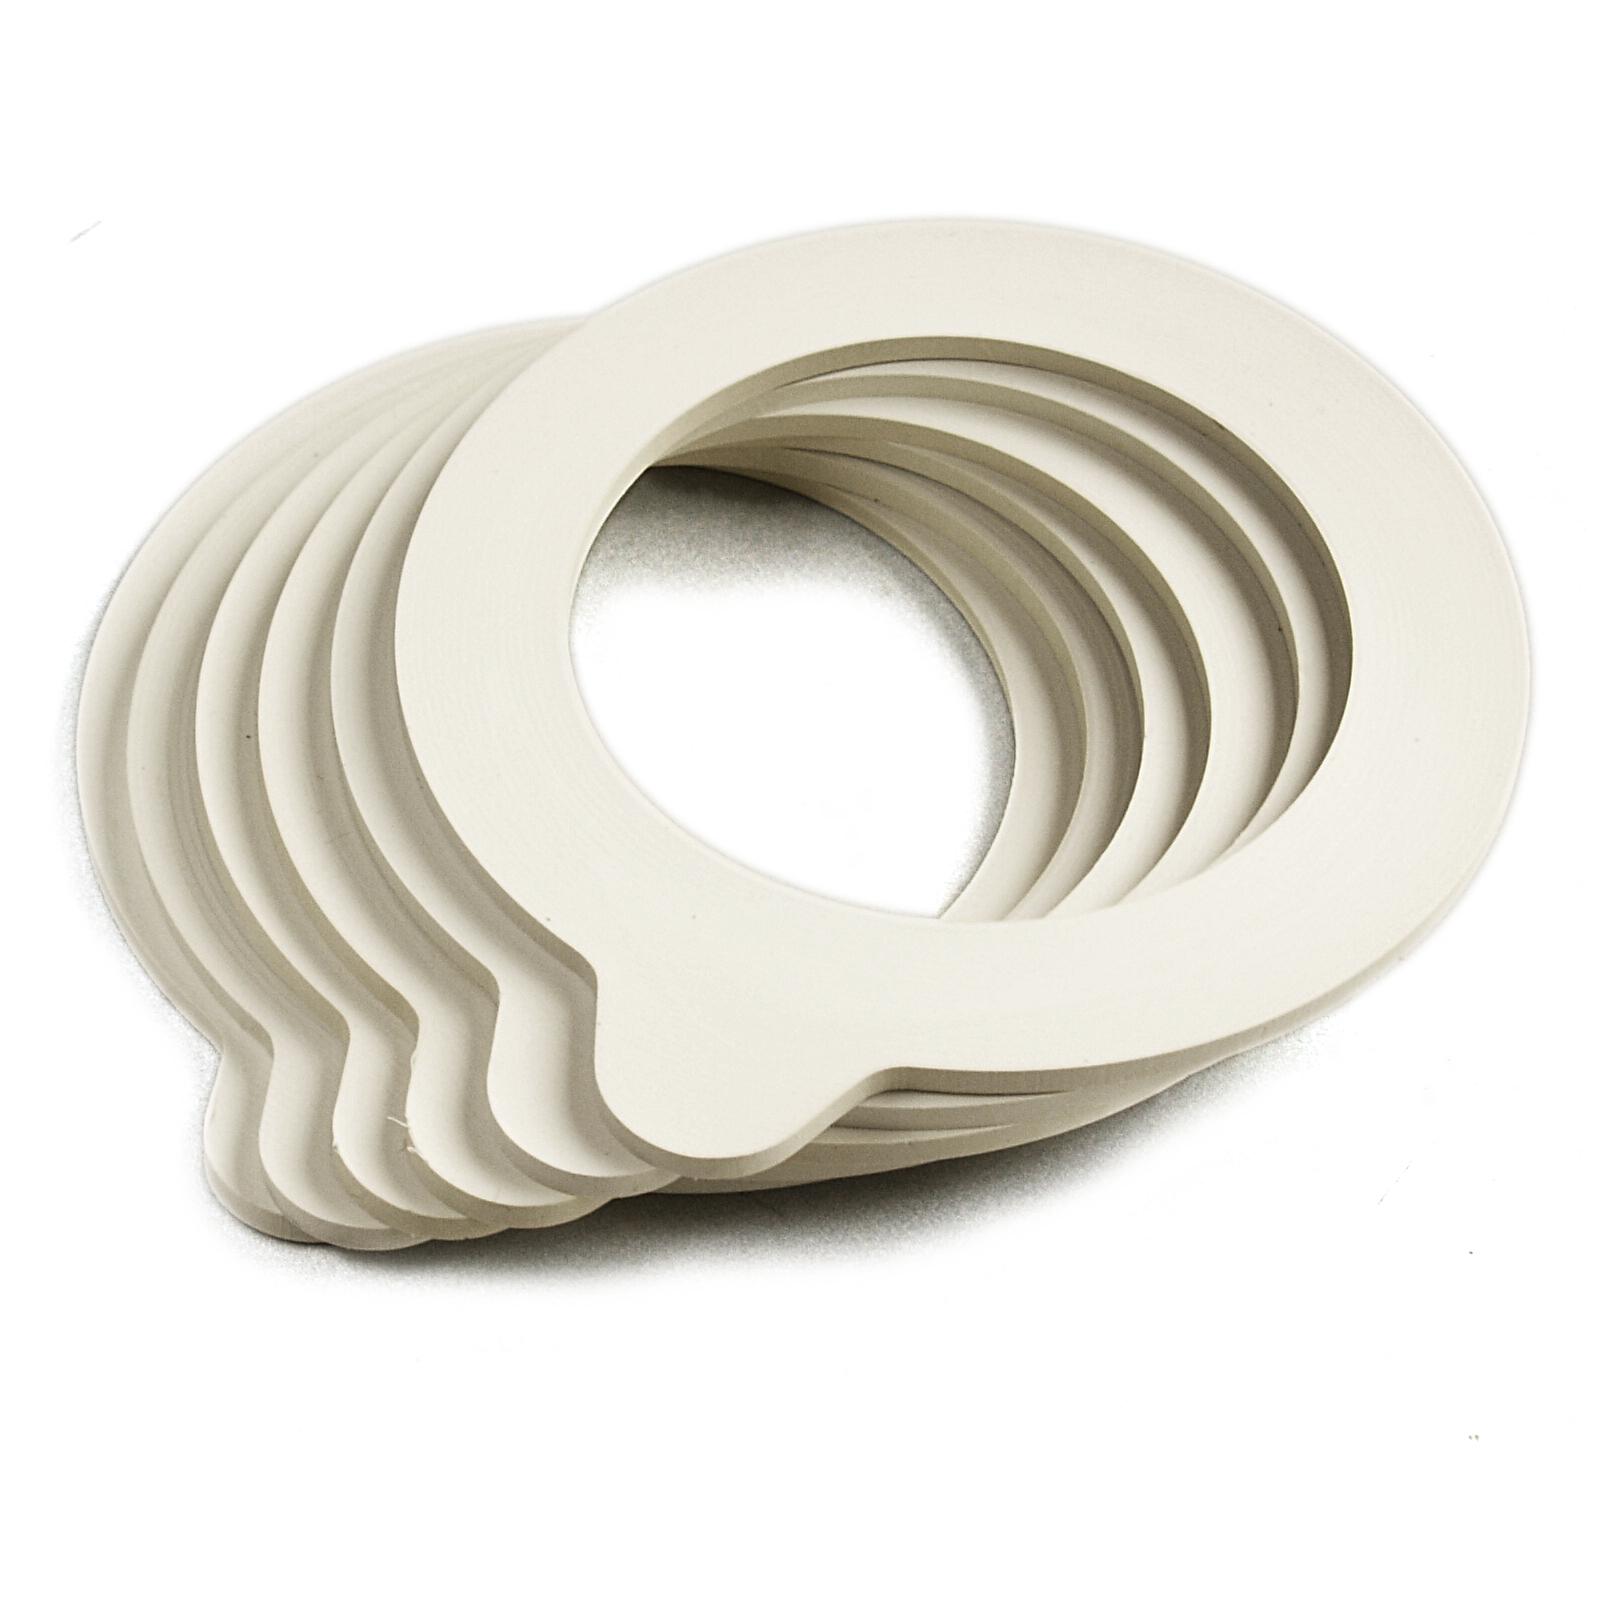 Bormioli Rocco Fido Jar White Replacement Gaskets, Set of 6